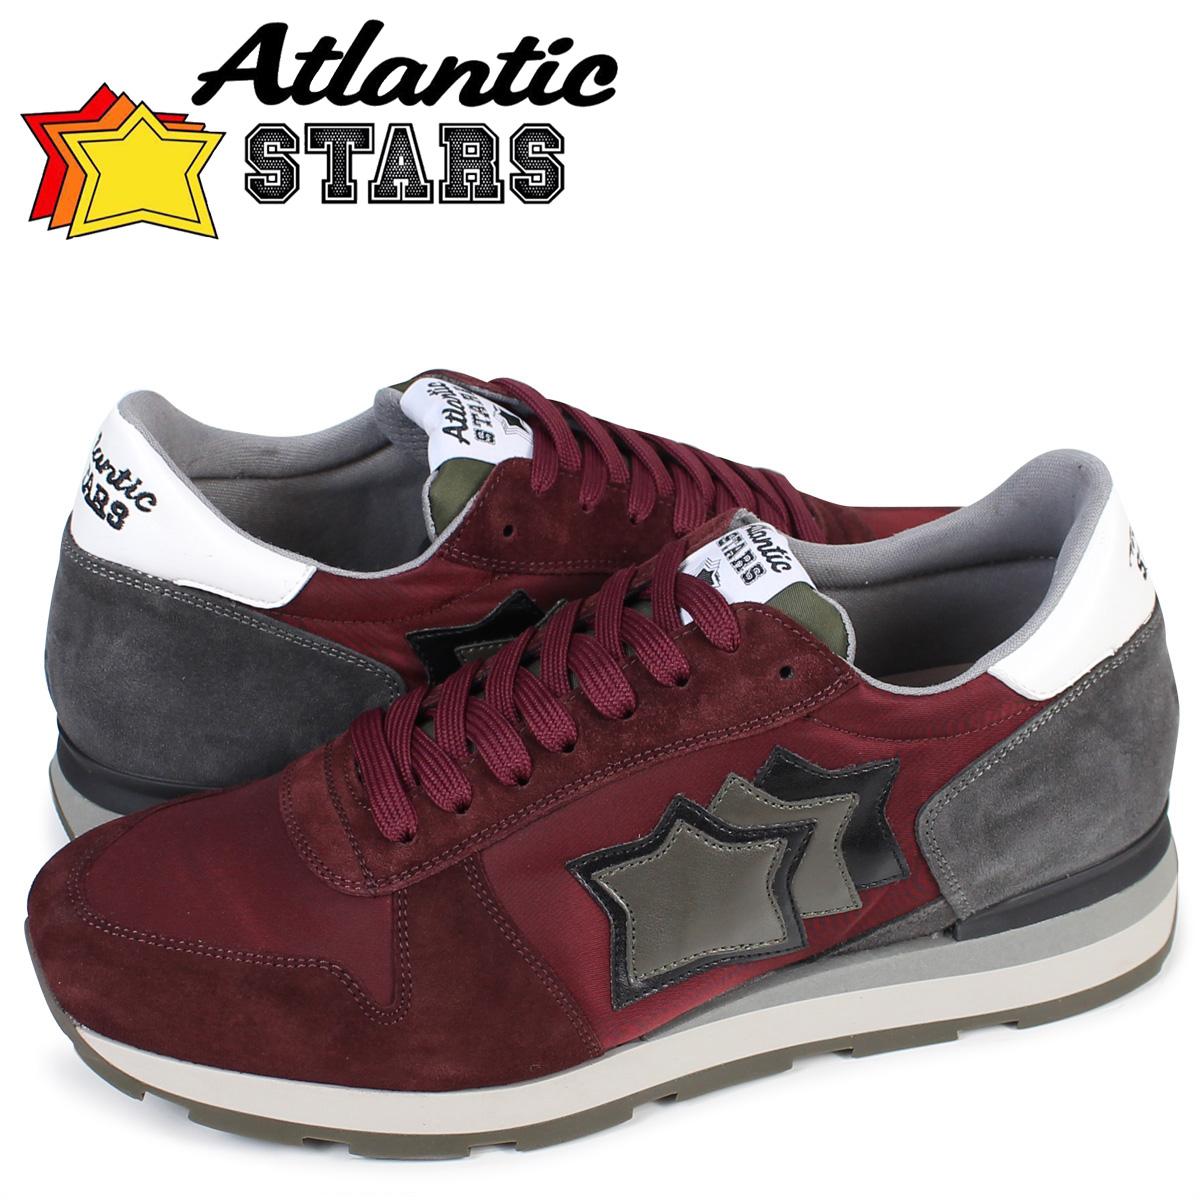 Atlantic STARS メンズ スニーカー アトランティックスターズ シリウス SIRIUS BPB64N 靴 バーガンディー